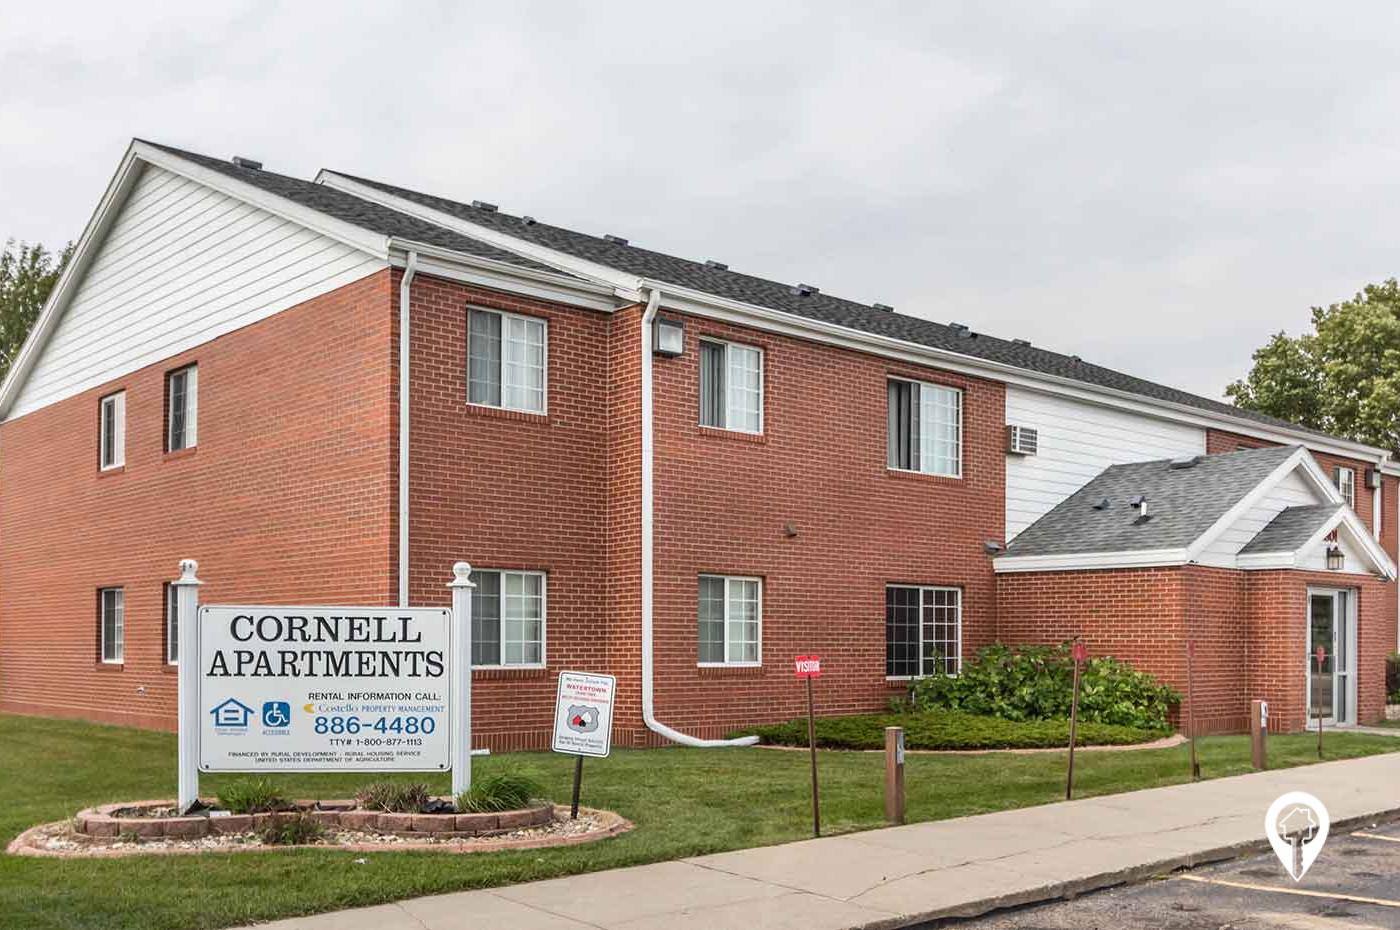 Cornell II Apartments